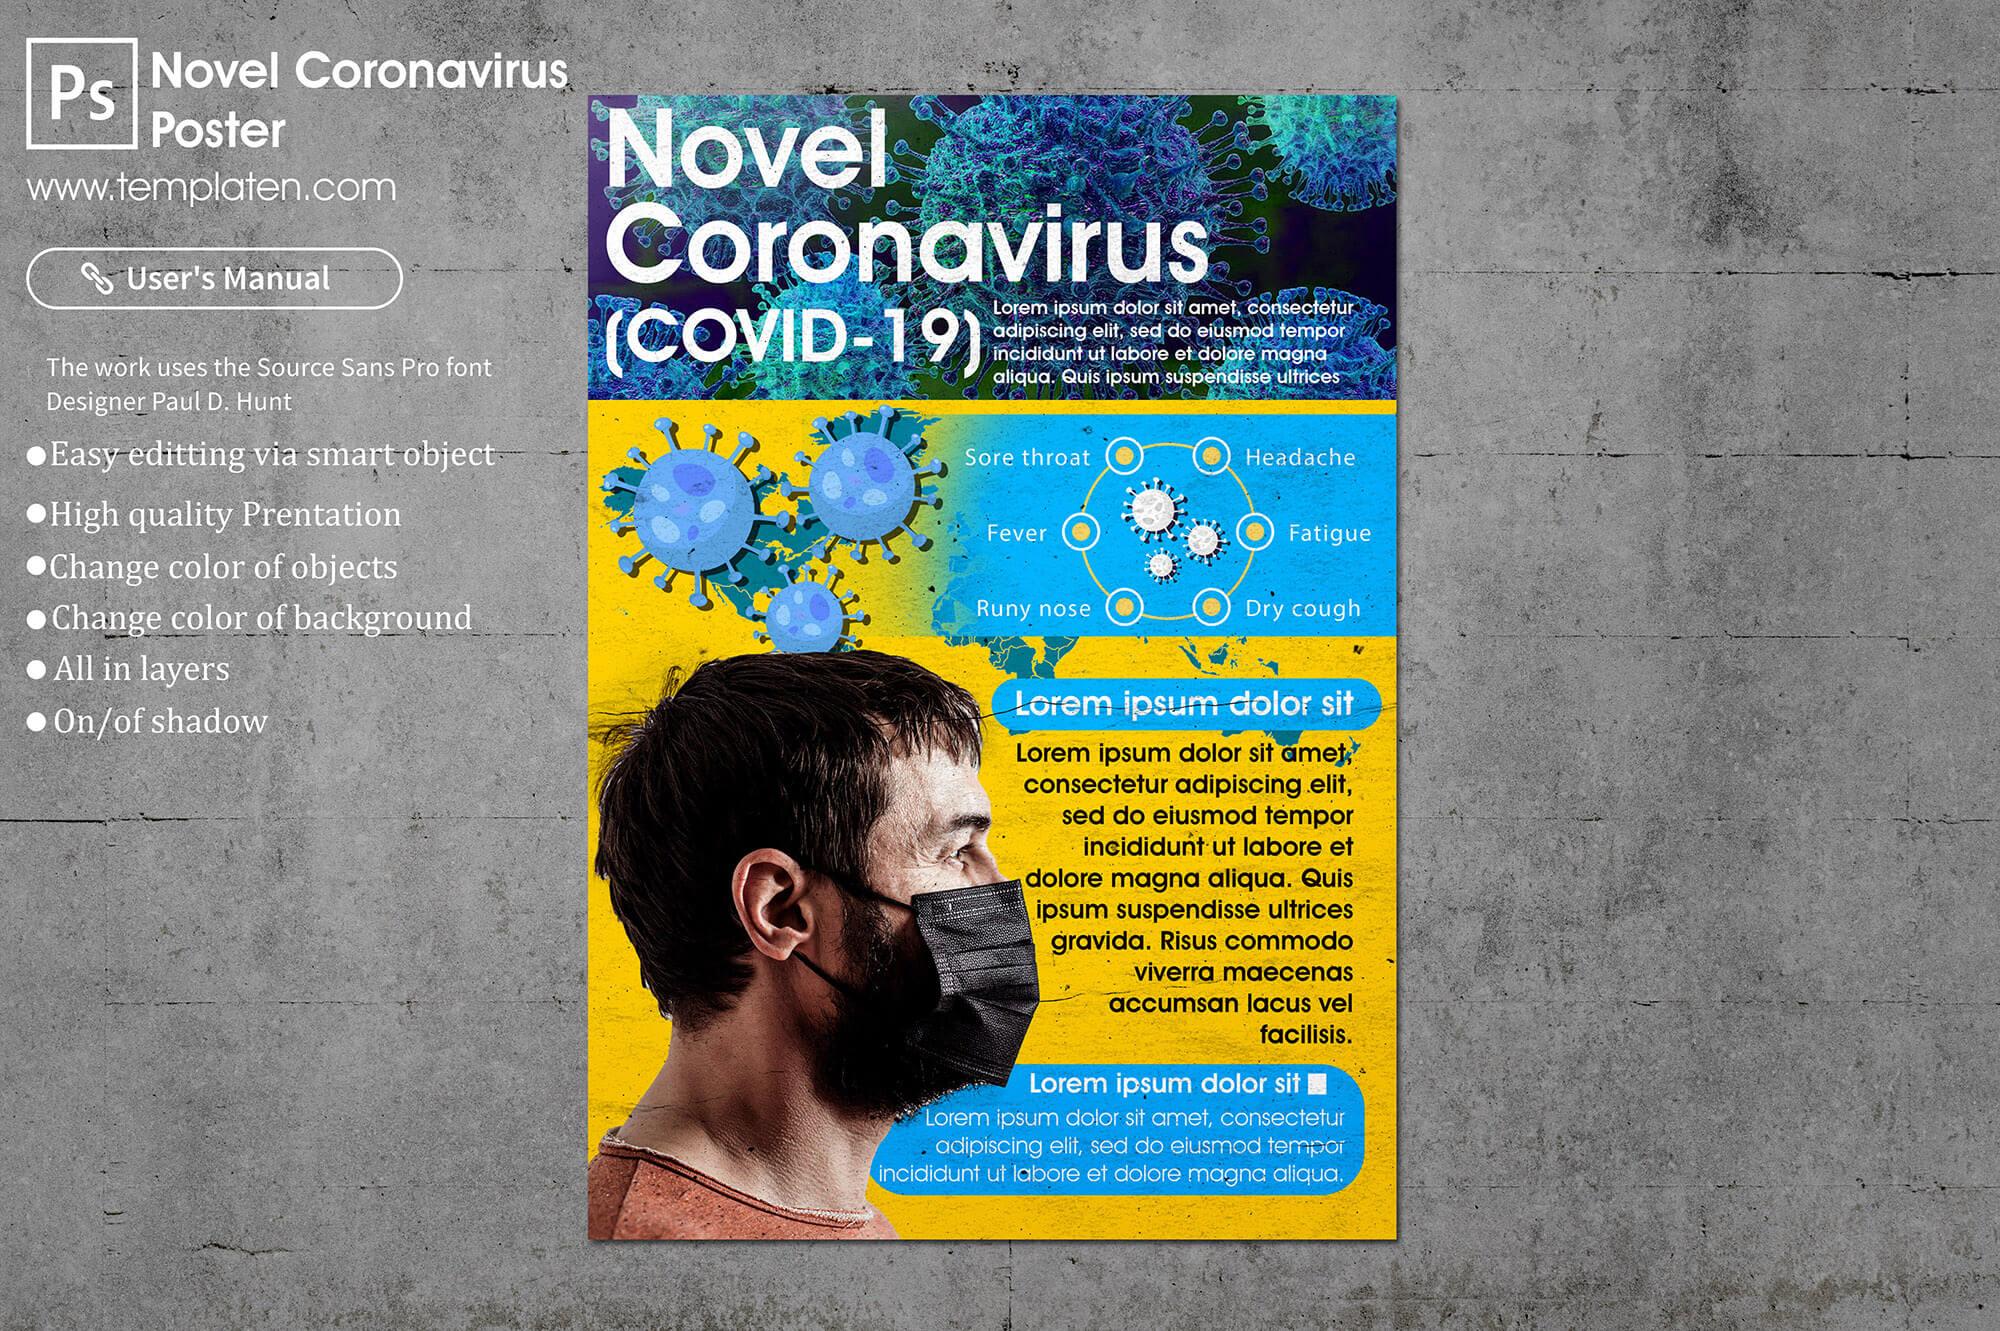 Free Corona Virus Poster PSD Template